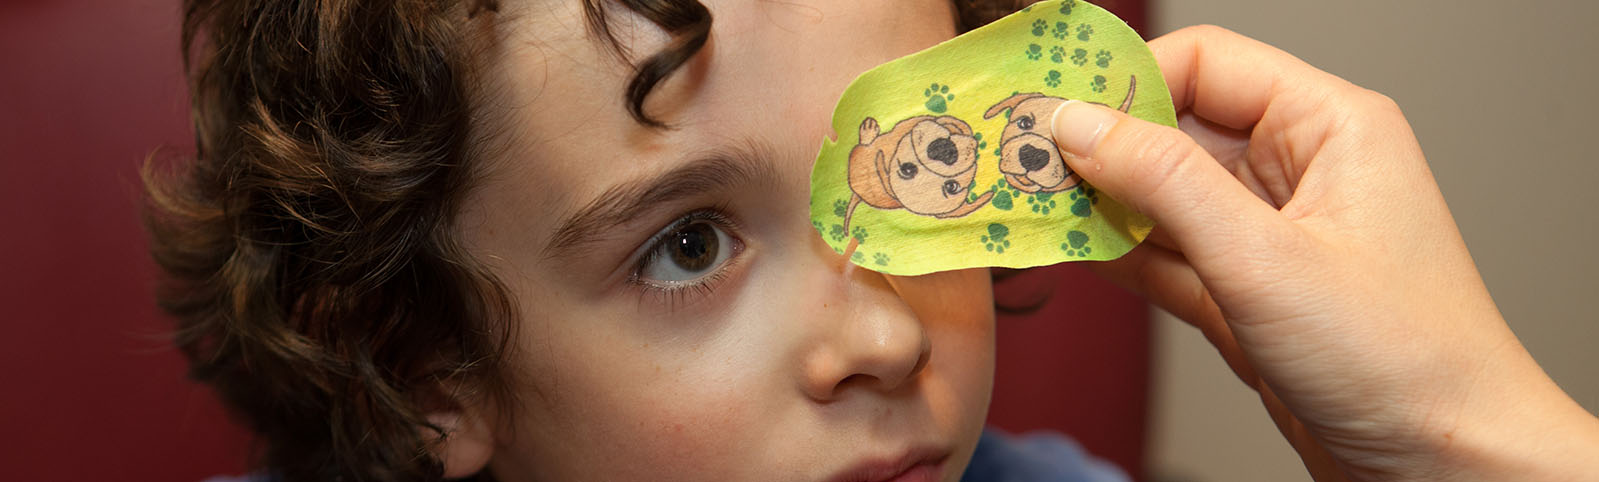 oftalmologia_pediatrica_ojo_vago_tratamiento_parches_